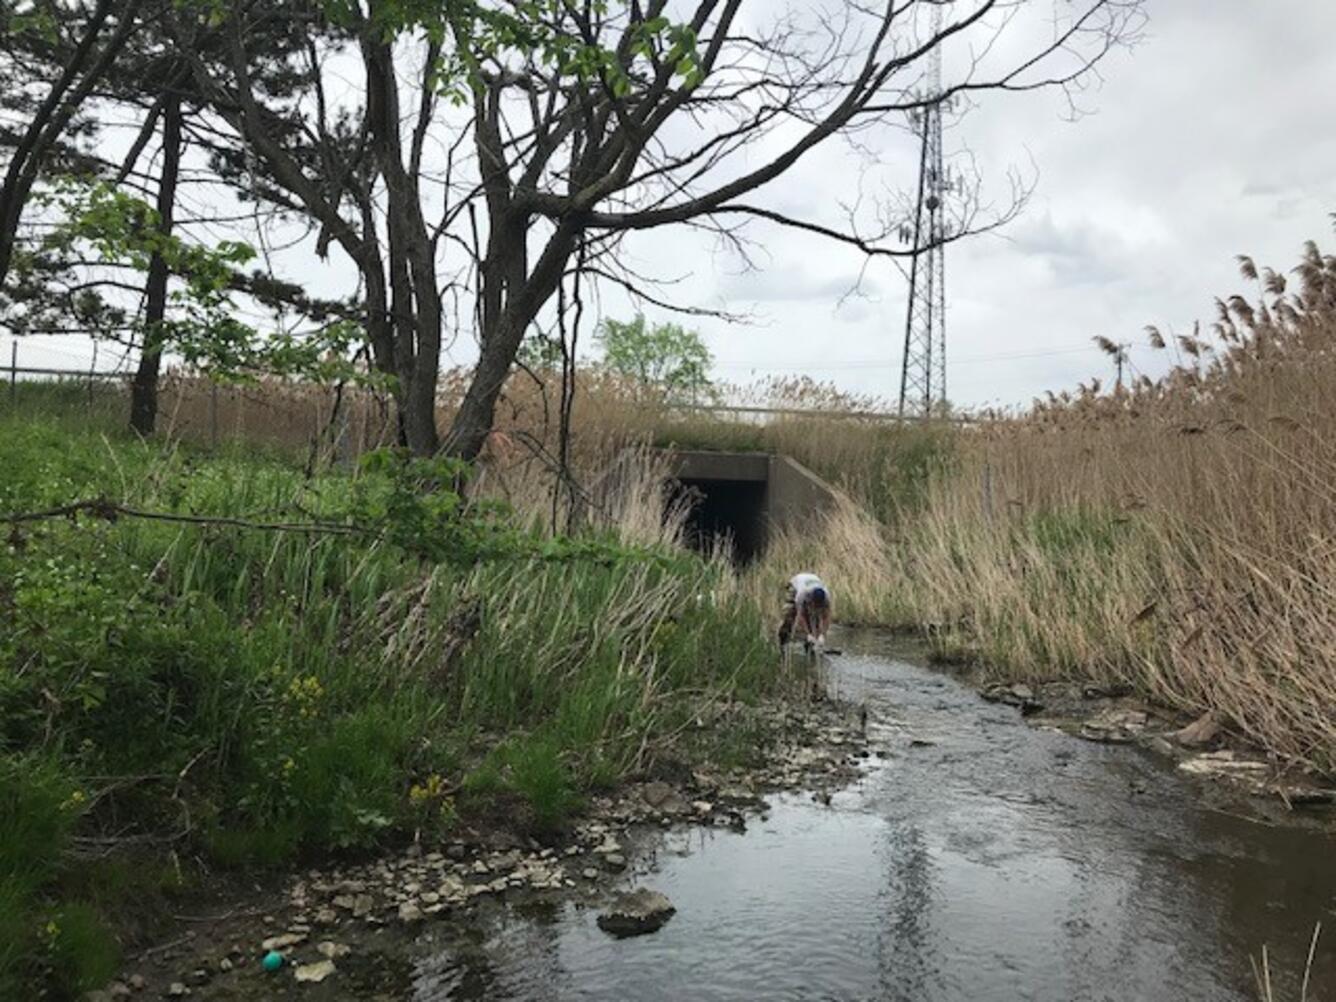 person leaning over in stream near bridge